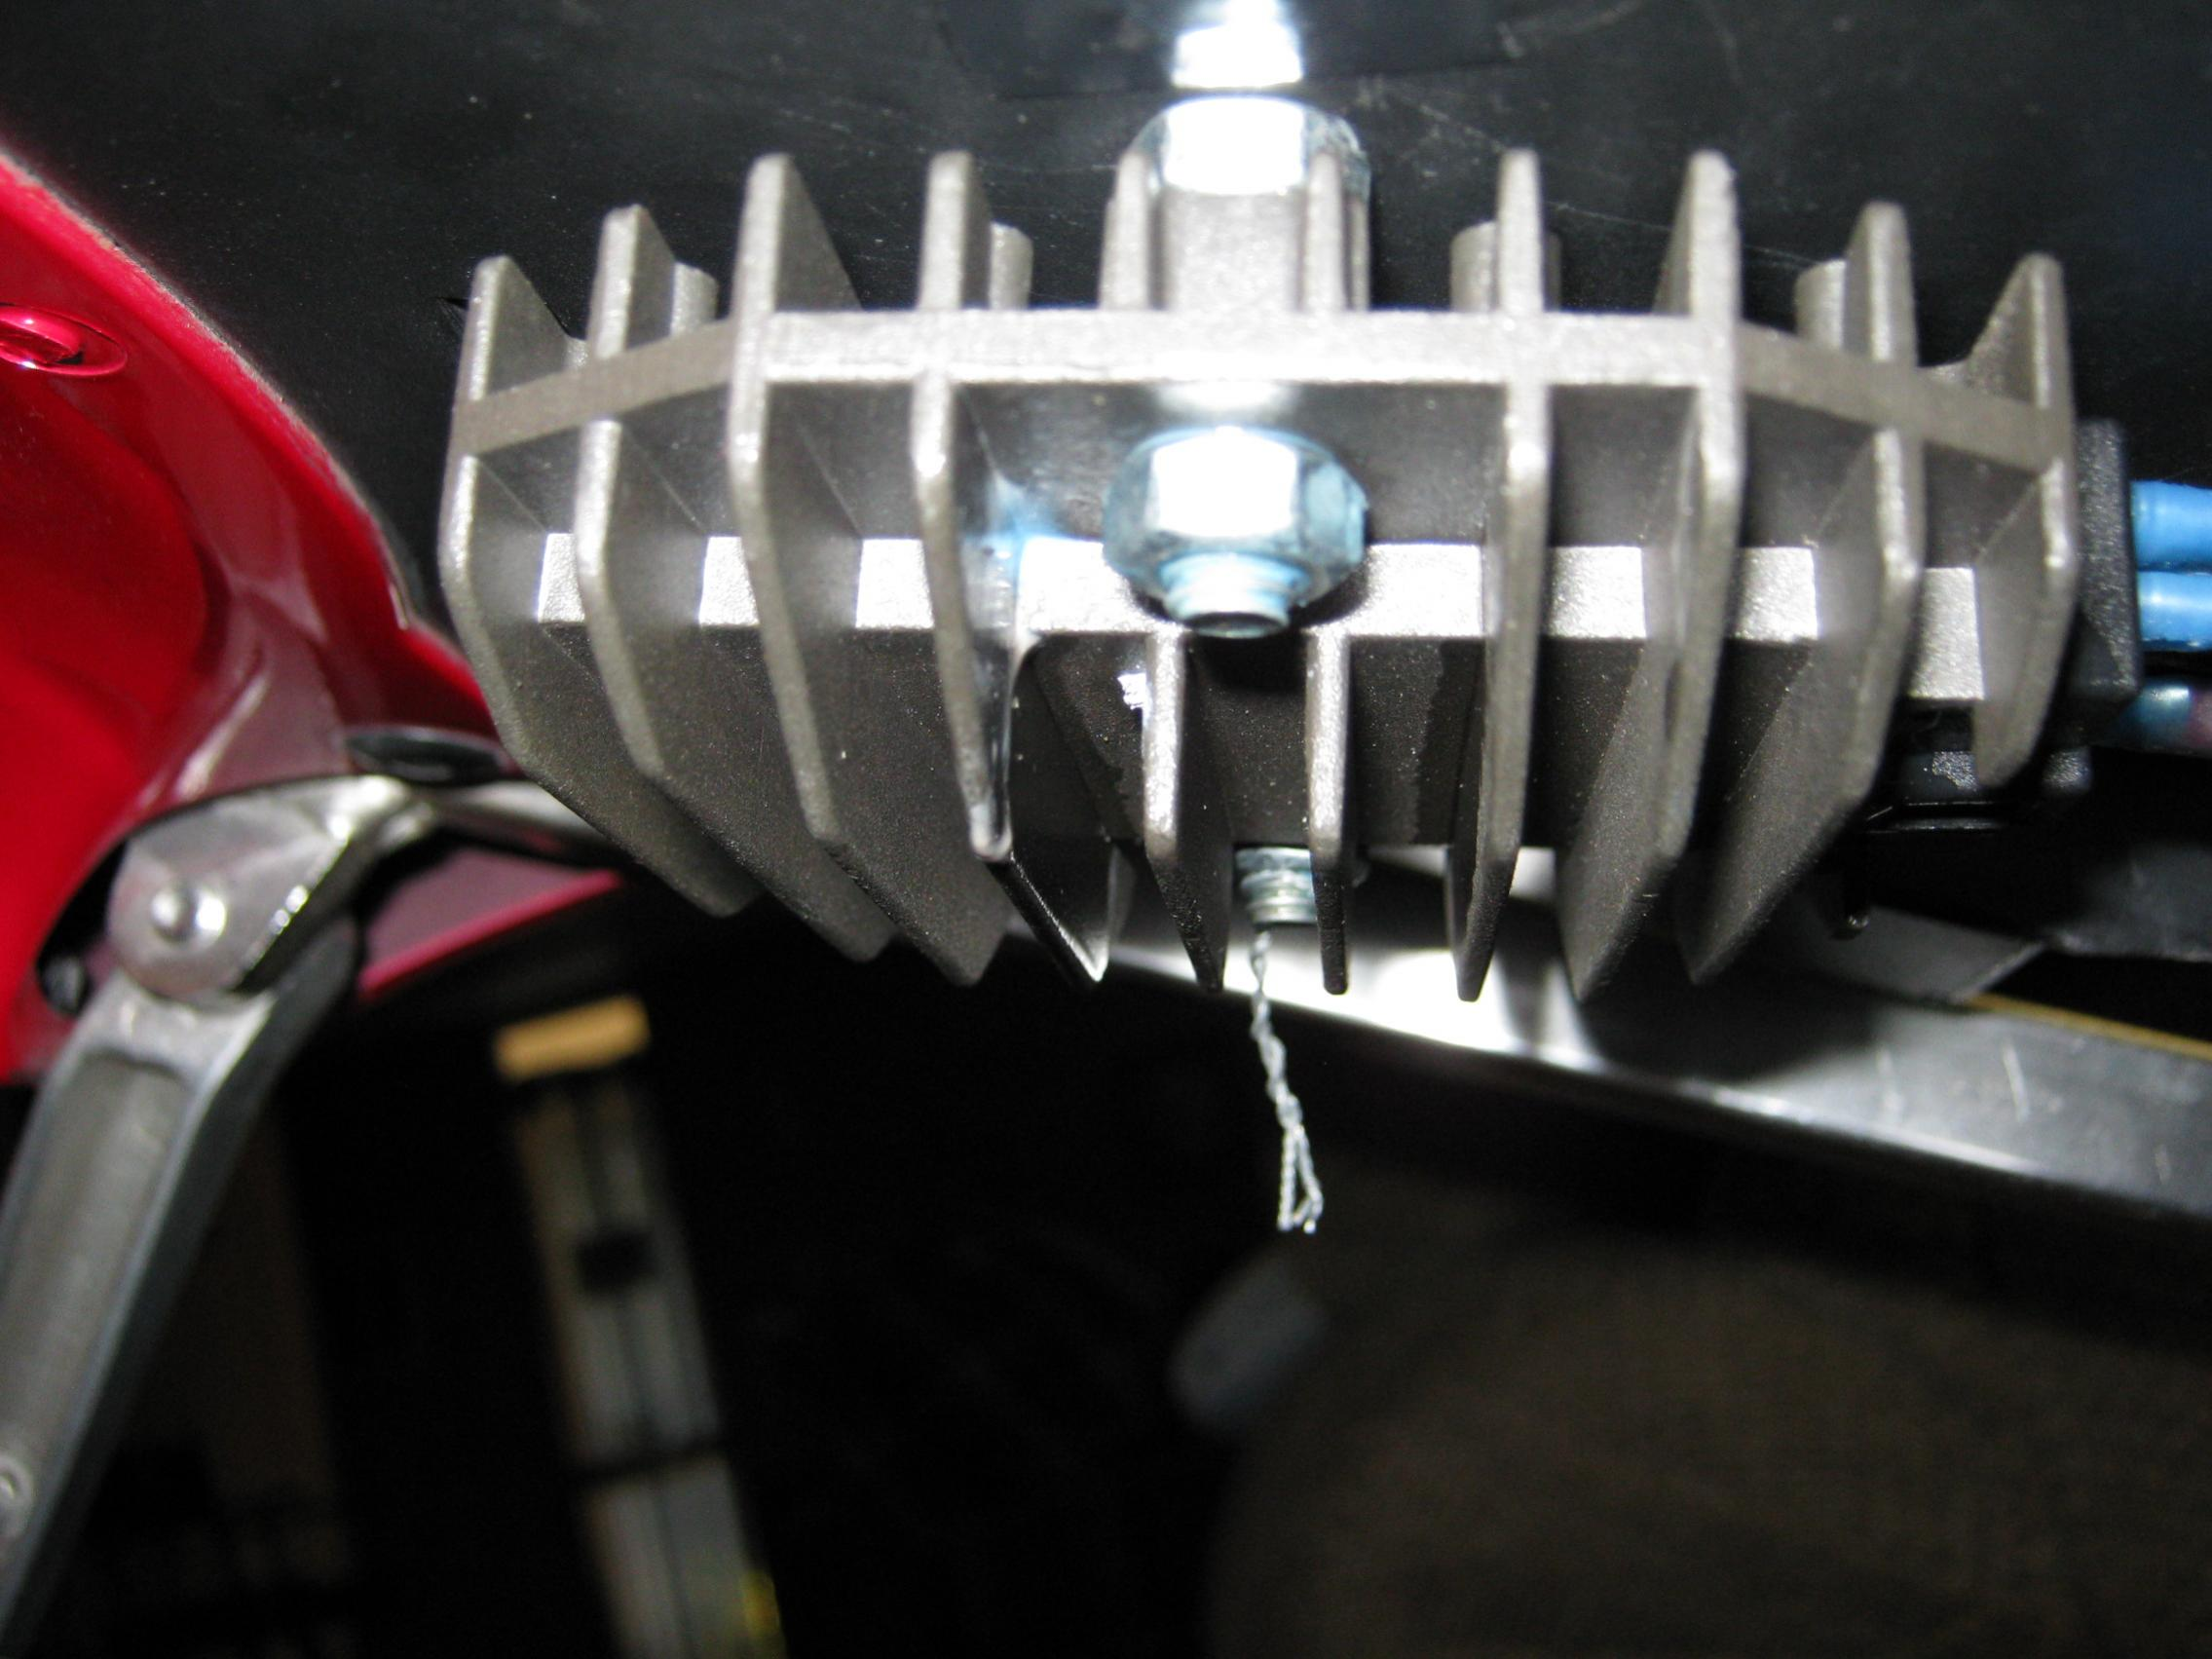 99 R6 Regulator Rectifier Problems/ Discussion - Yamaha R6 Forum